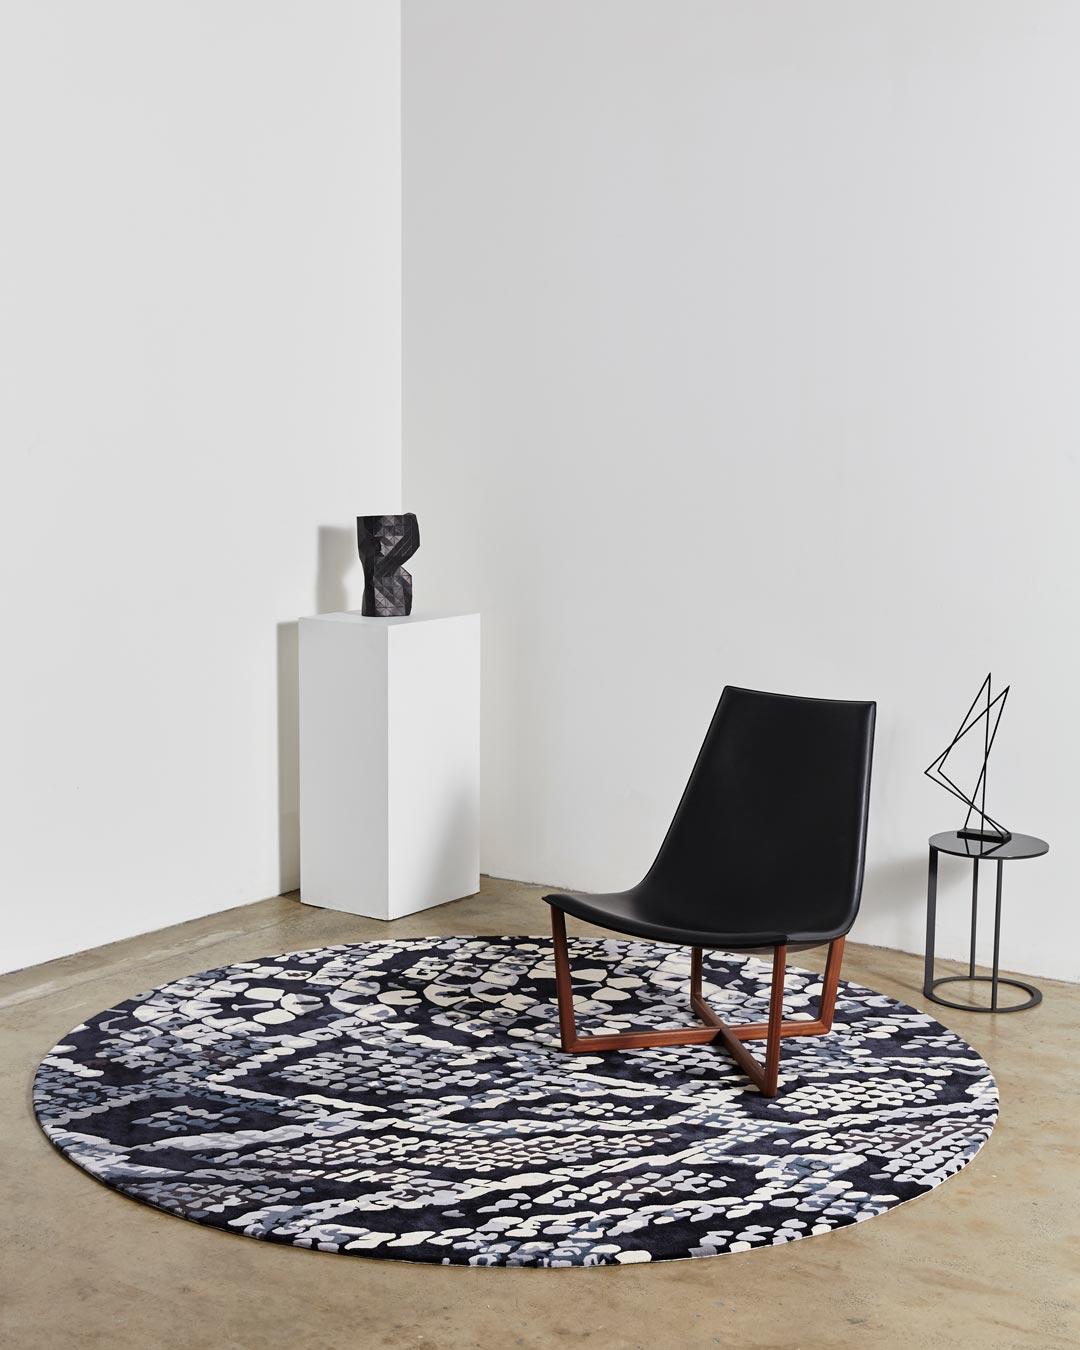 location shot of medusa rug by emma elizabeth designs round snake print